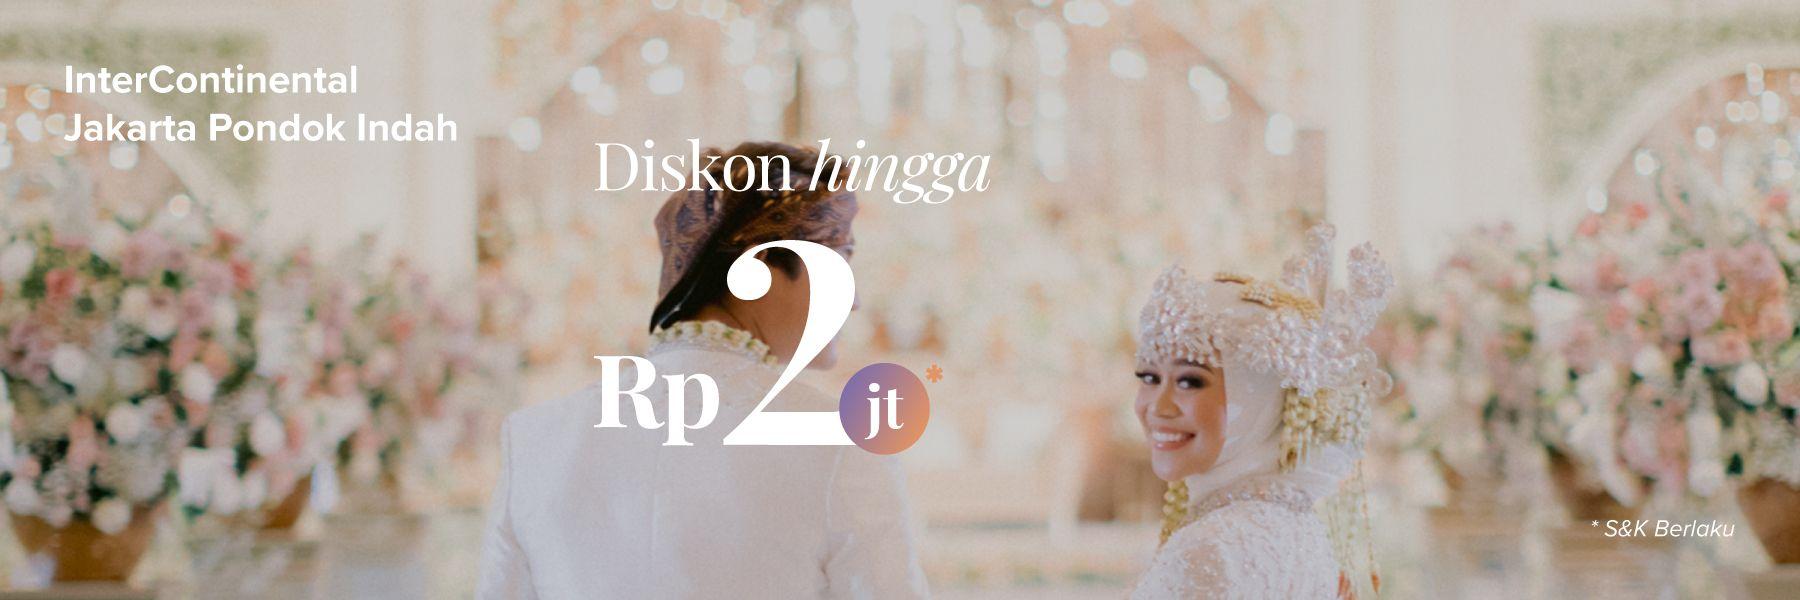 Diskon s.d Rp 2 Juta untuk Paket di InterContinental Jakarta